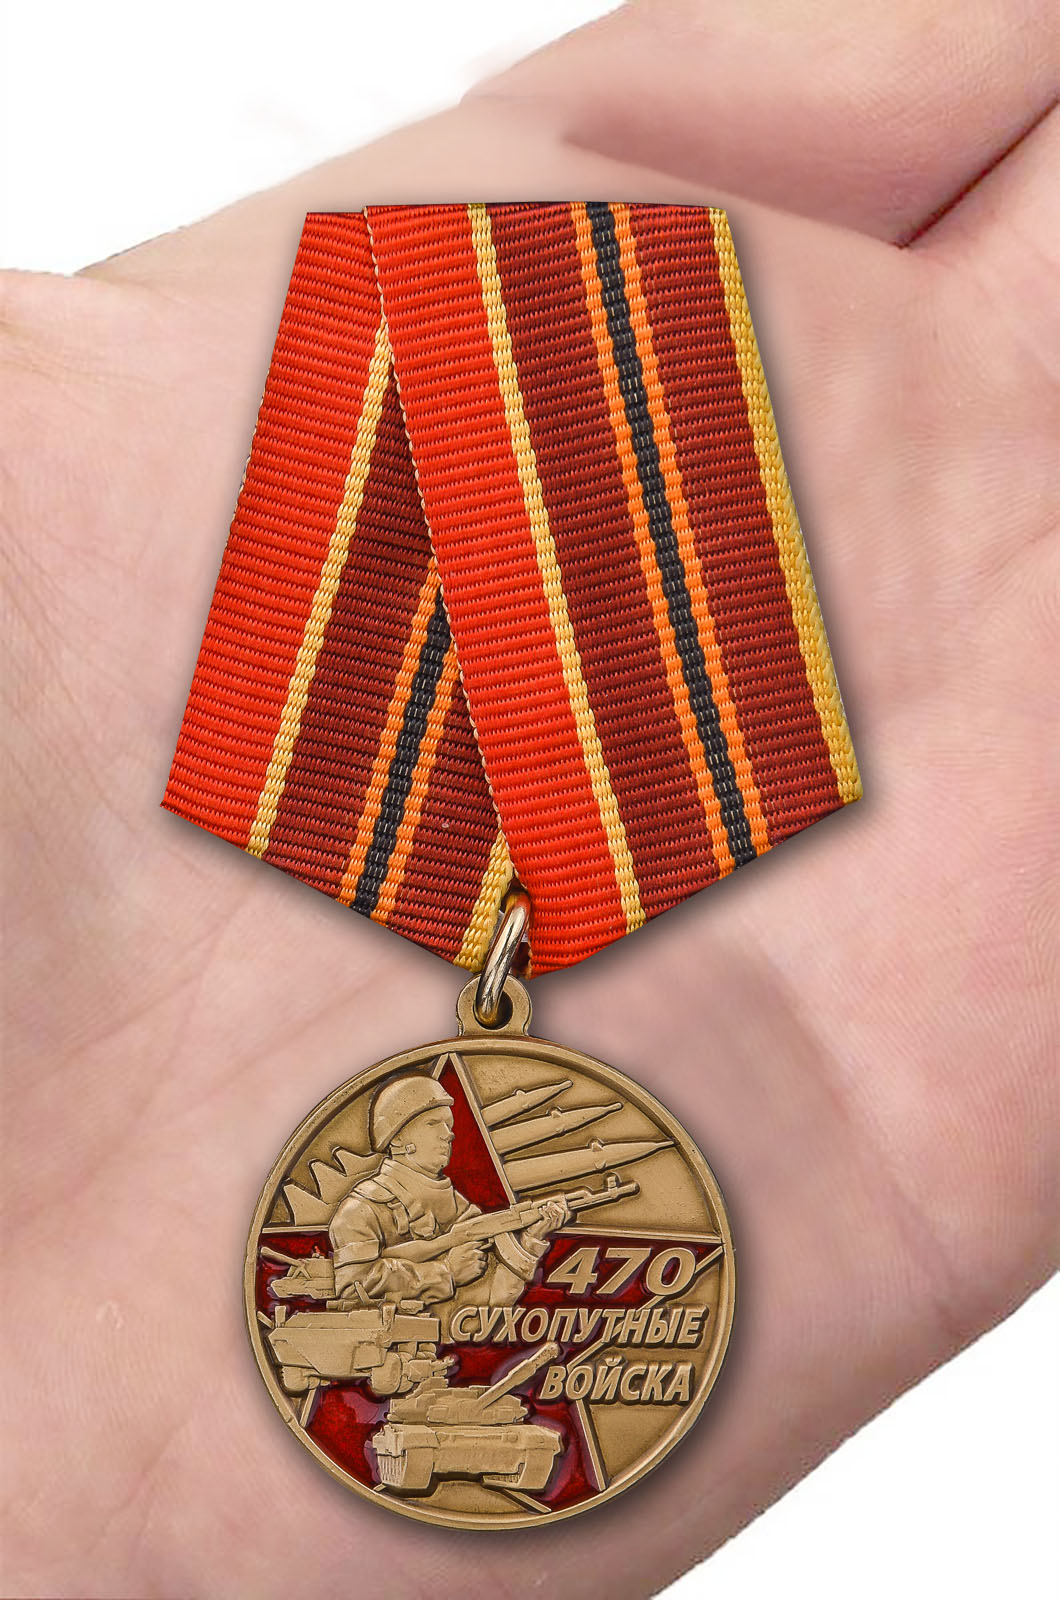 Памятная медаль 470 лет Сухопутным войскам - вид на ладони